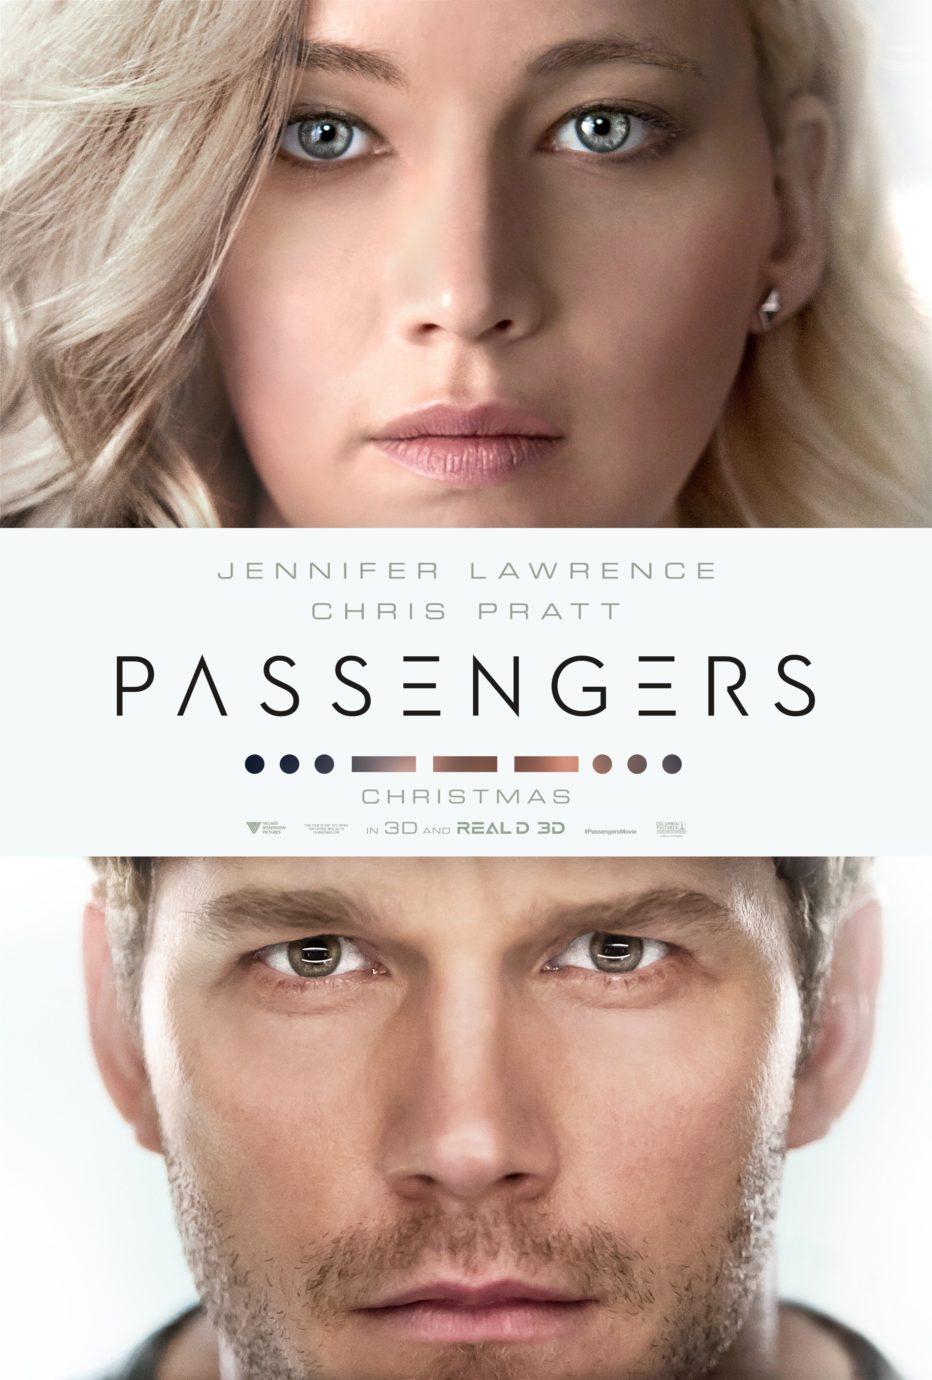 Trailer de Passengers con Jennifer Lawrence y Chris Pratt